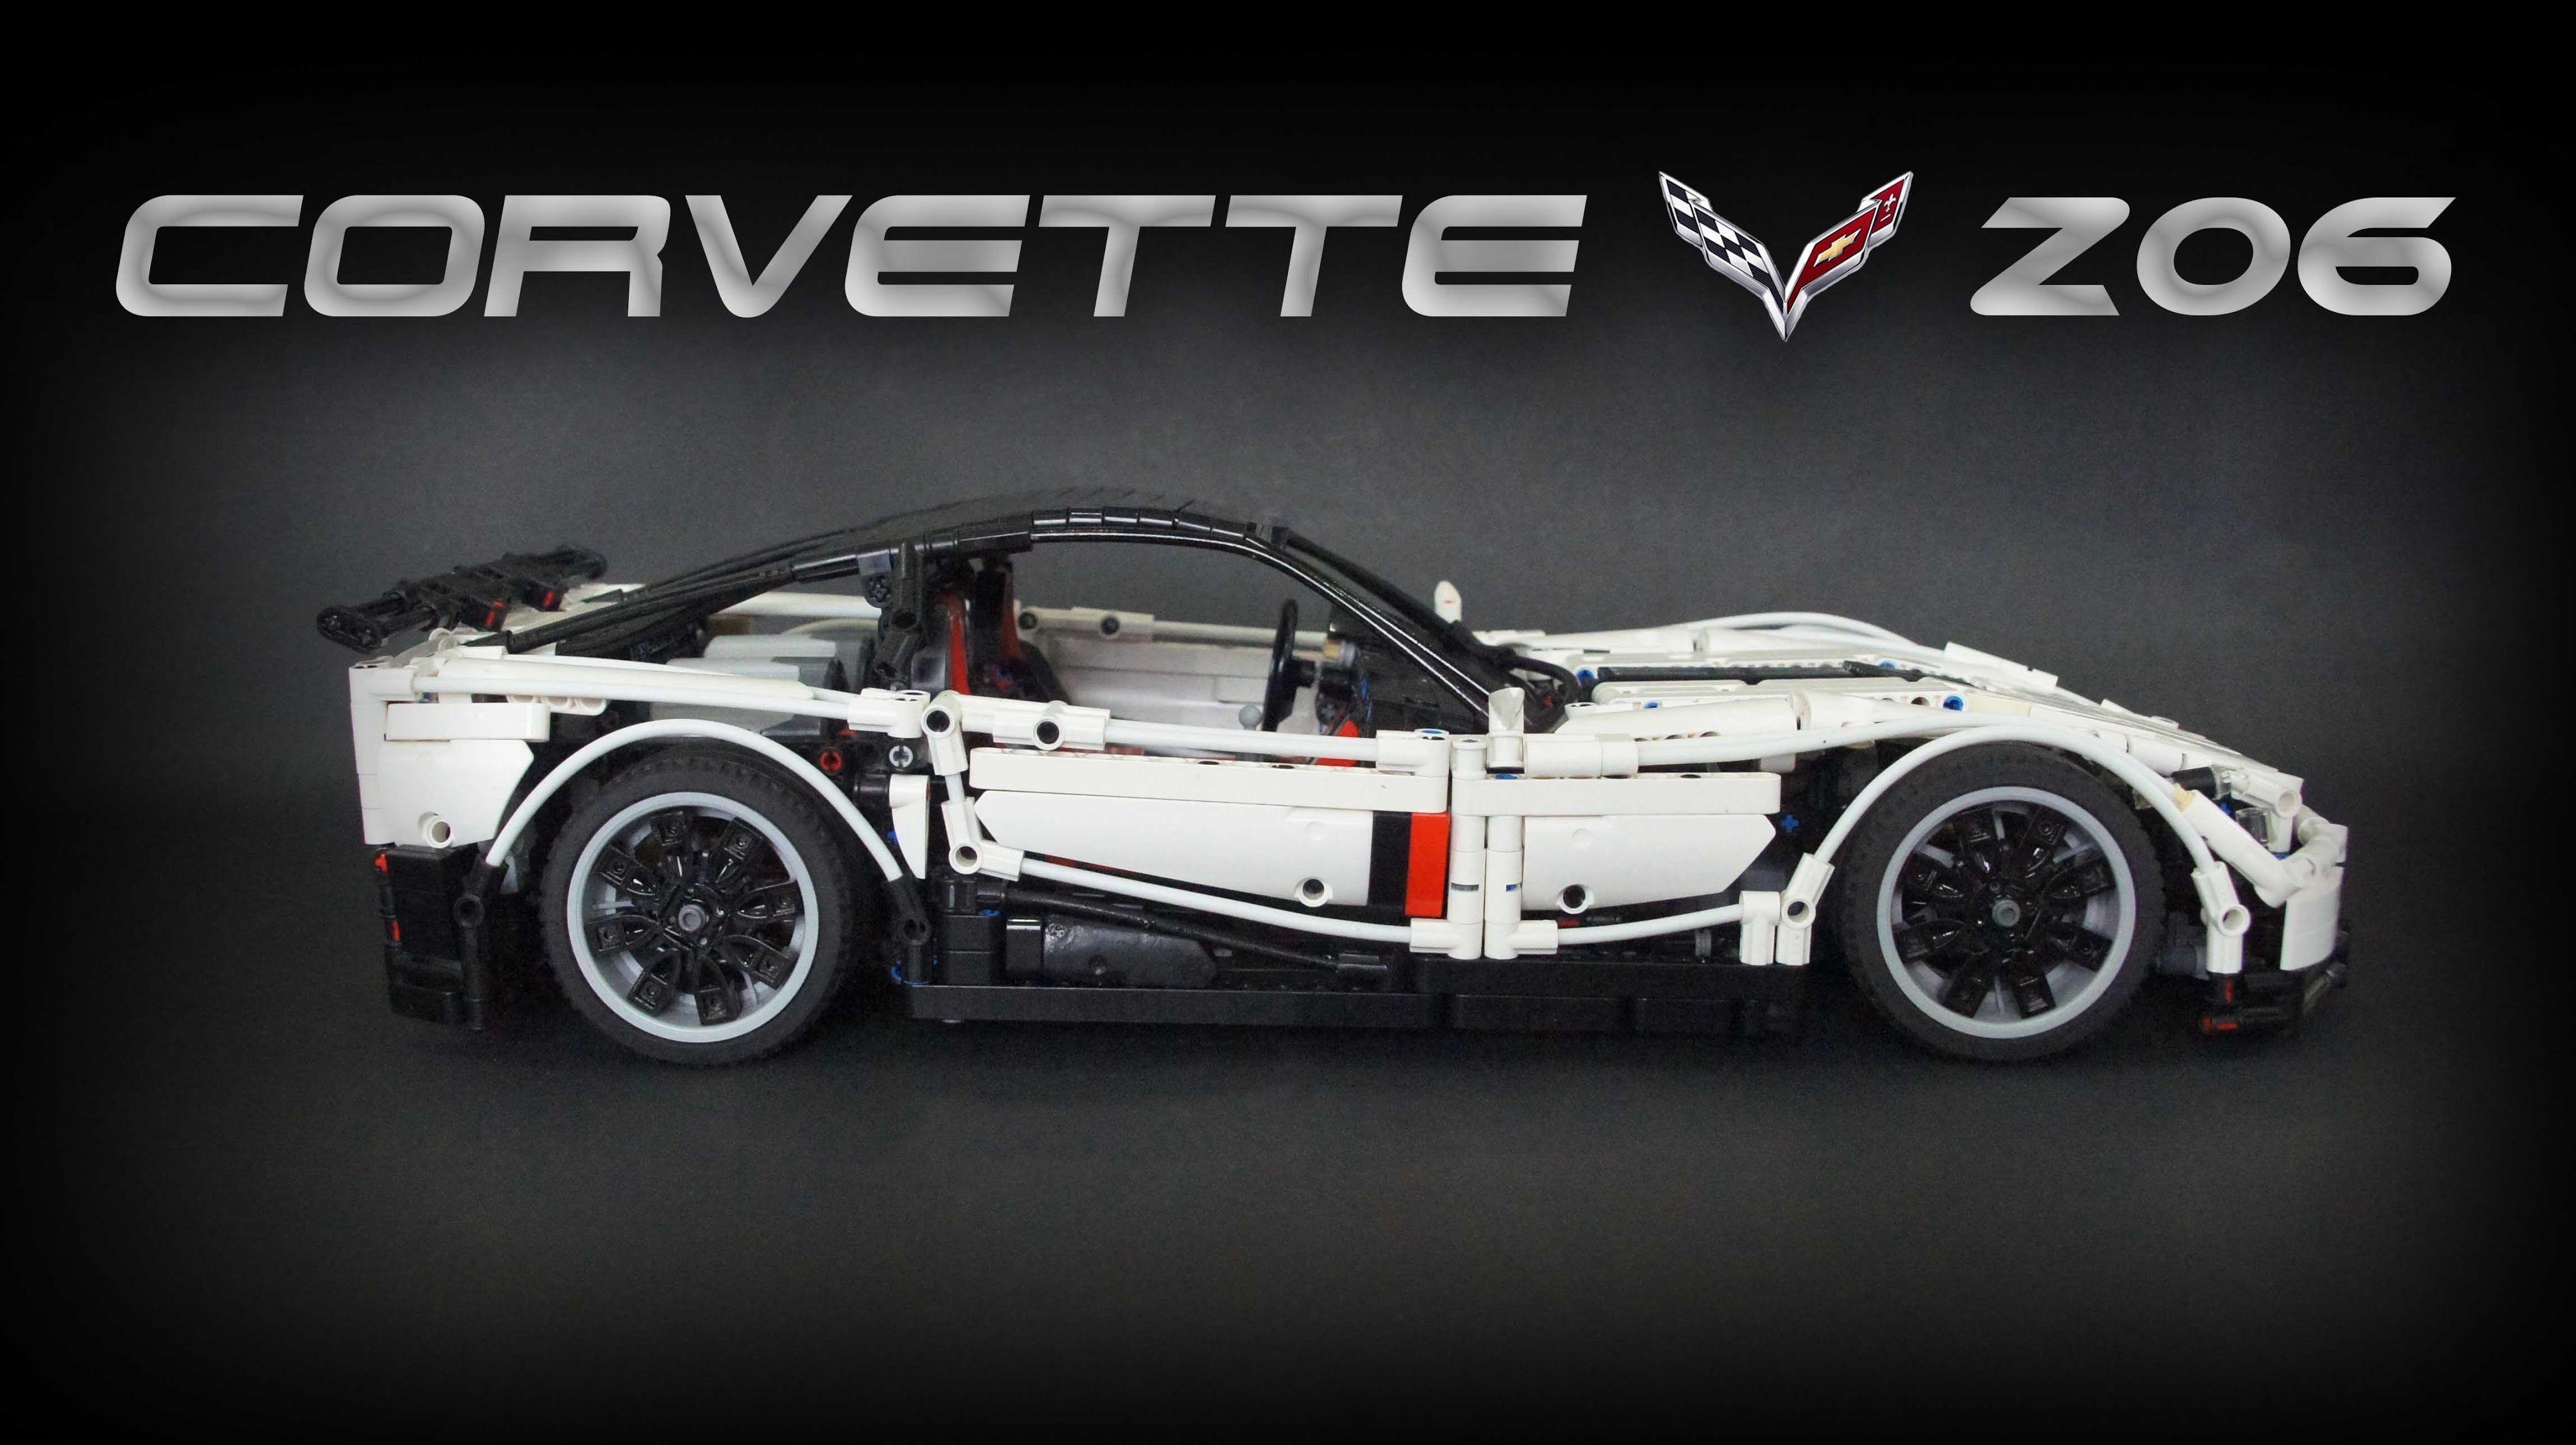 Chevrolet Z06 Technic Rc Corvette Lego OXPwuTikZ